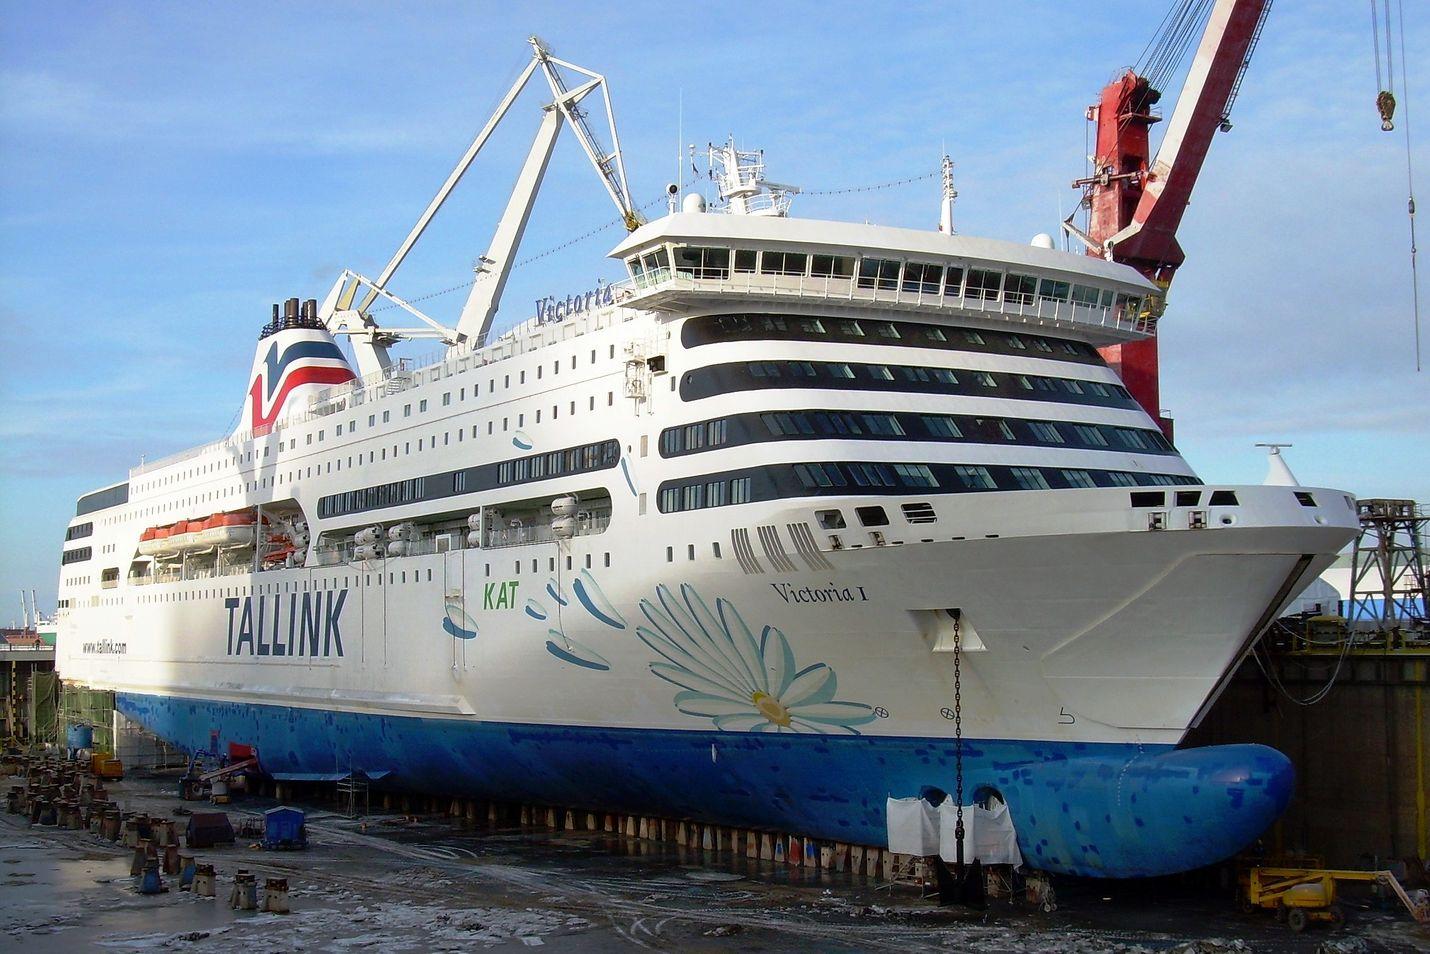 Victoria 1 Laiva